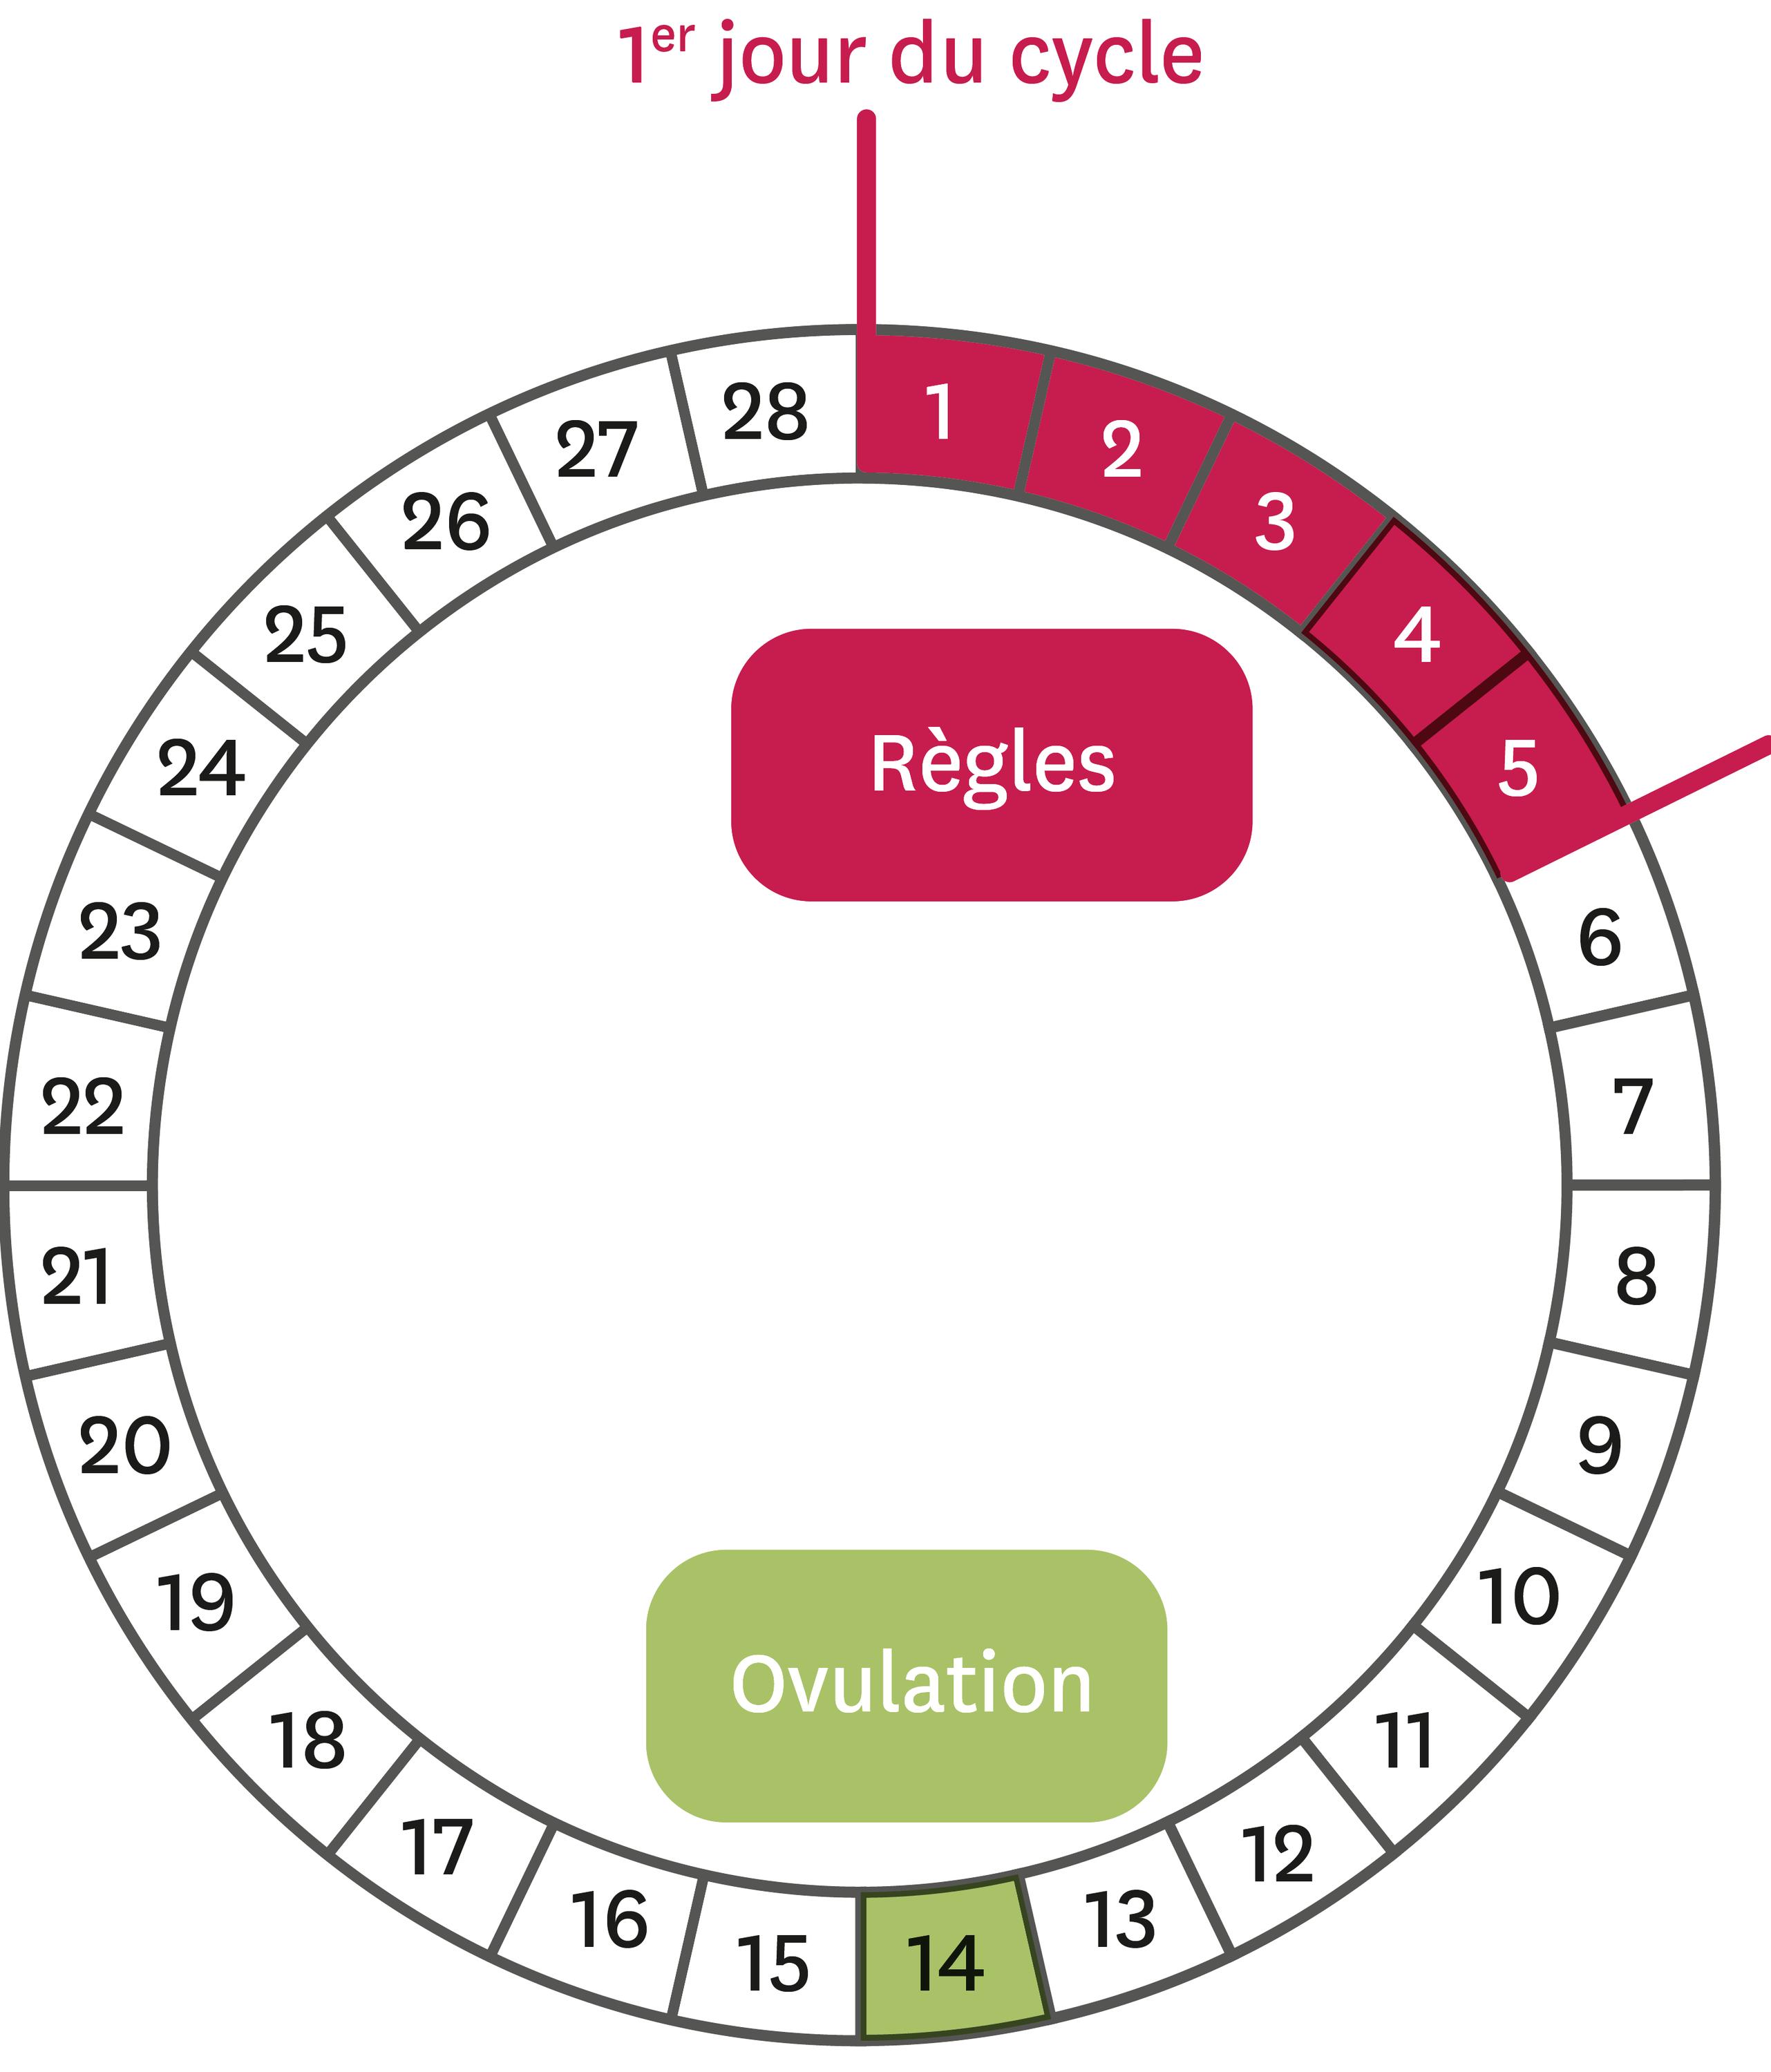 Le cycle féminin théorique.